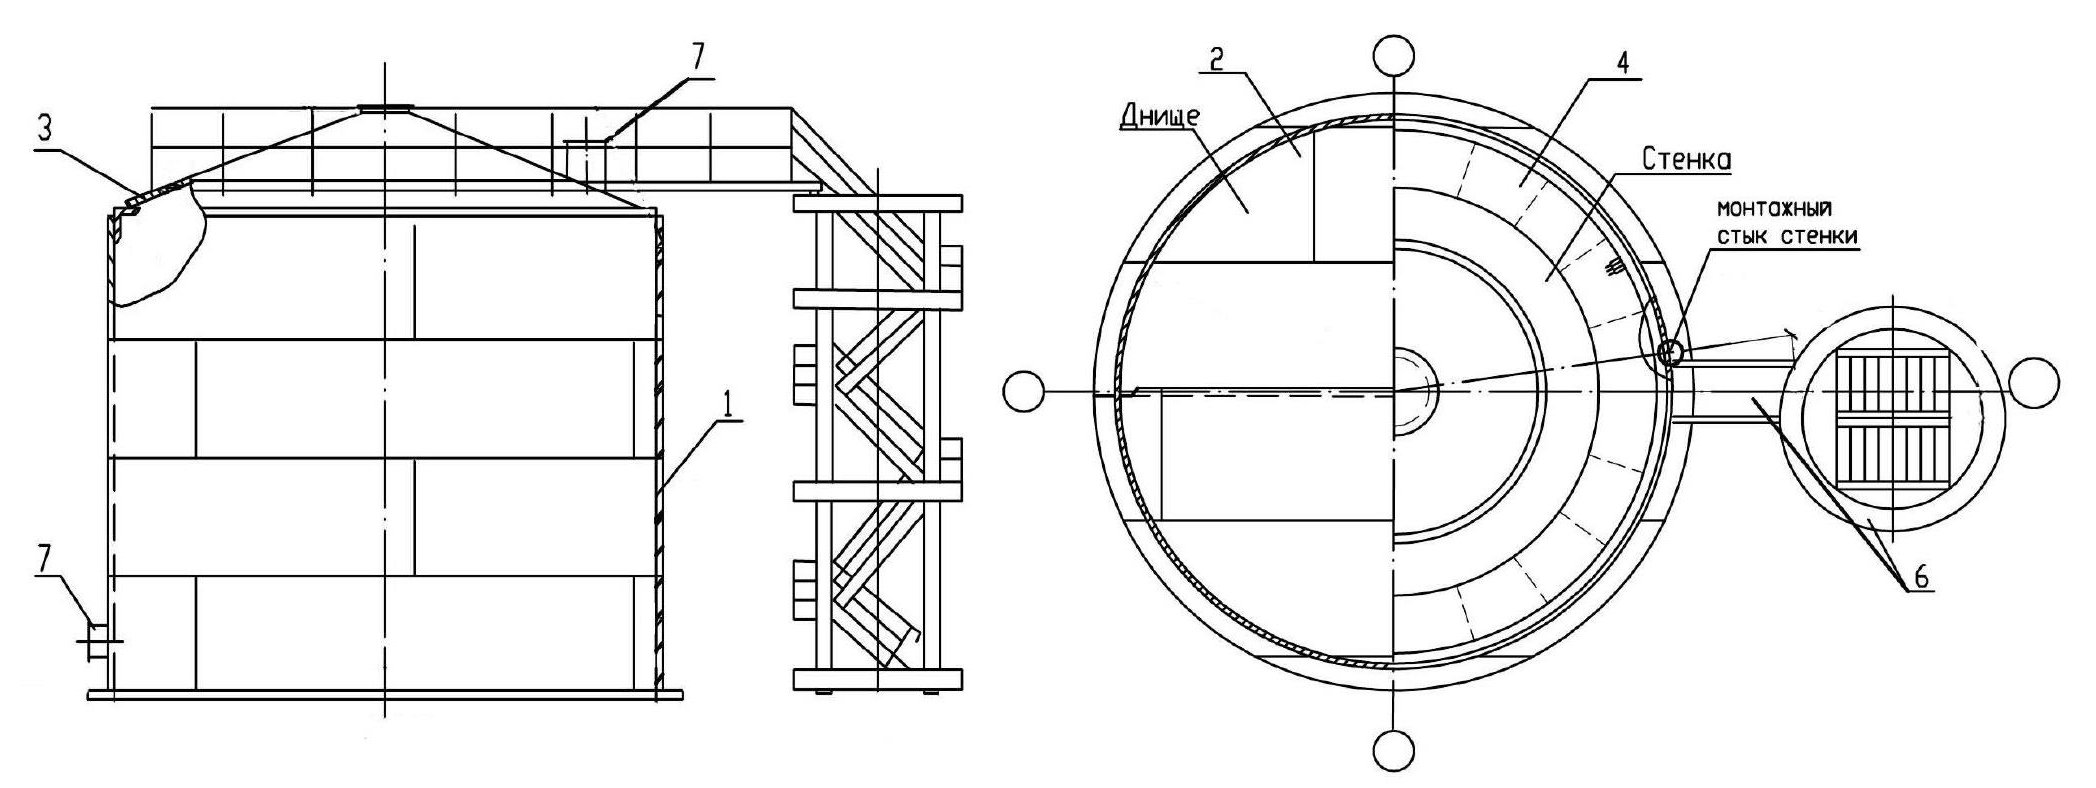 схема обвязки бака аккумулятора гвс